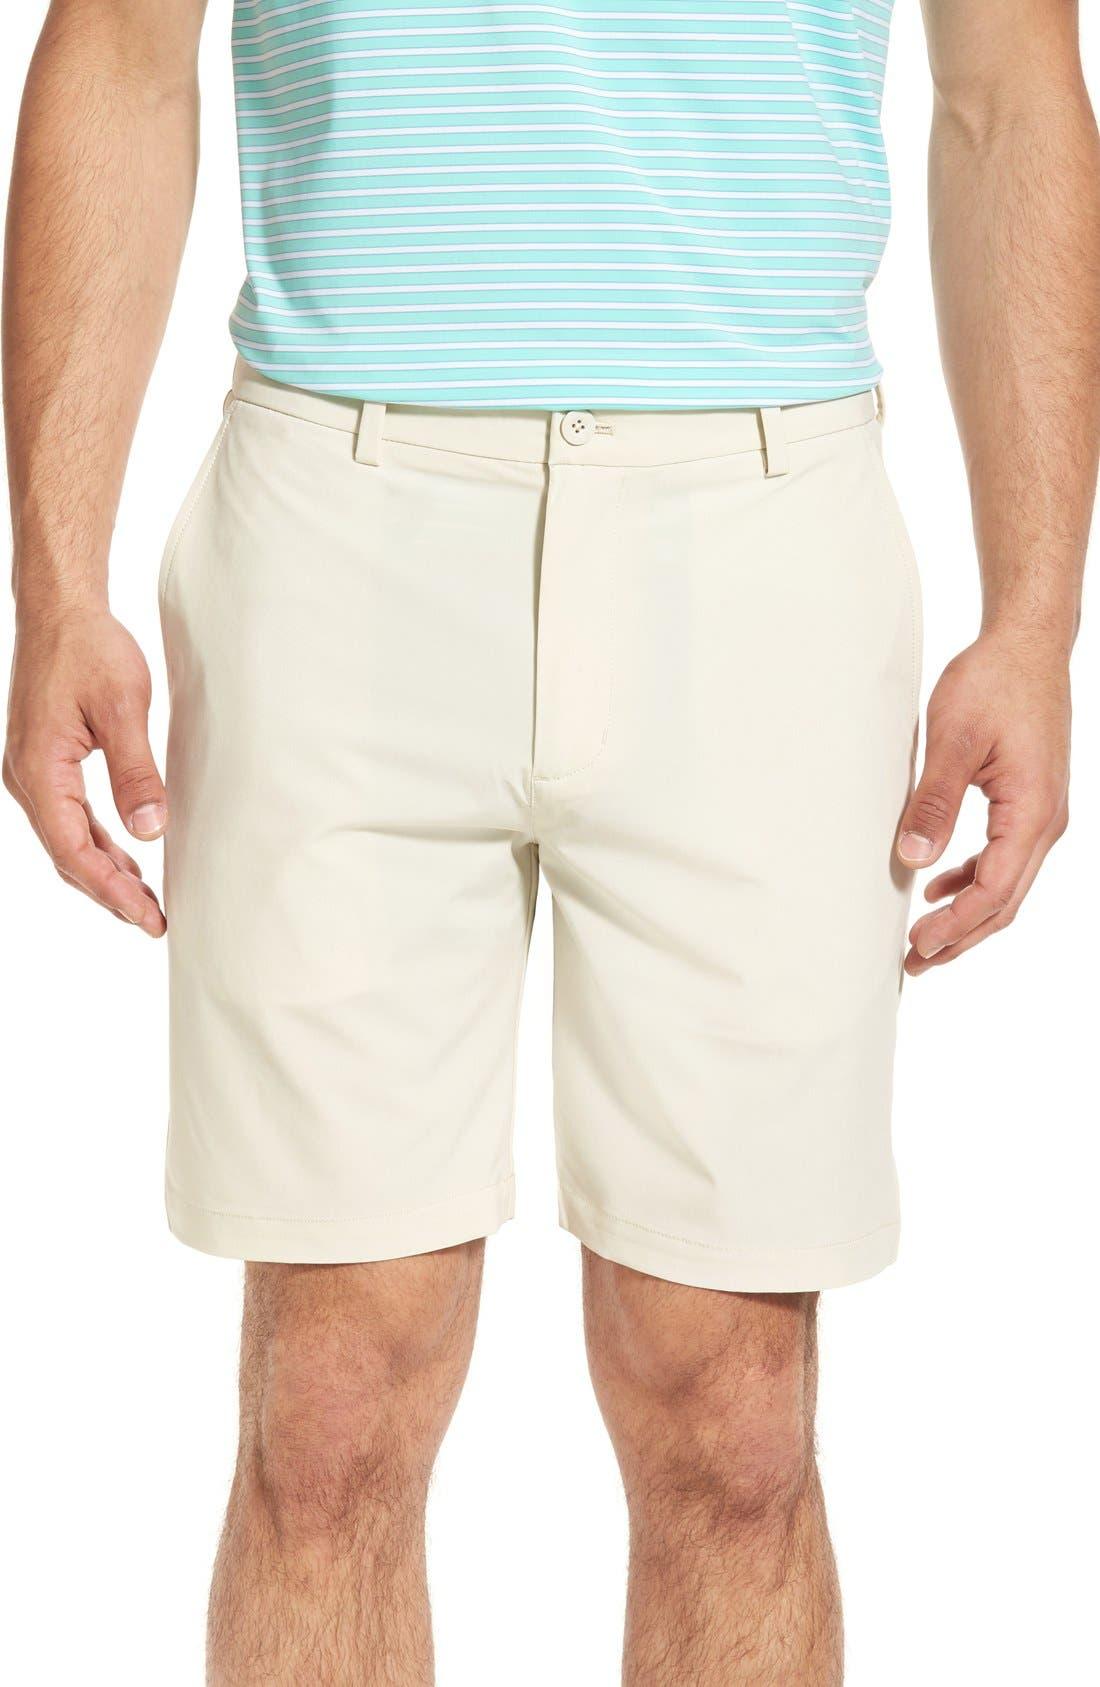 8 Inch Performance Breaker Shorts,                             Main thumbnail 4, color,